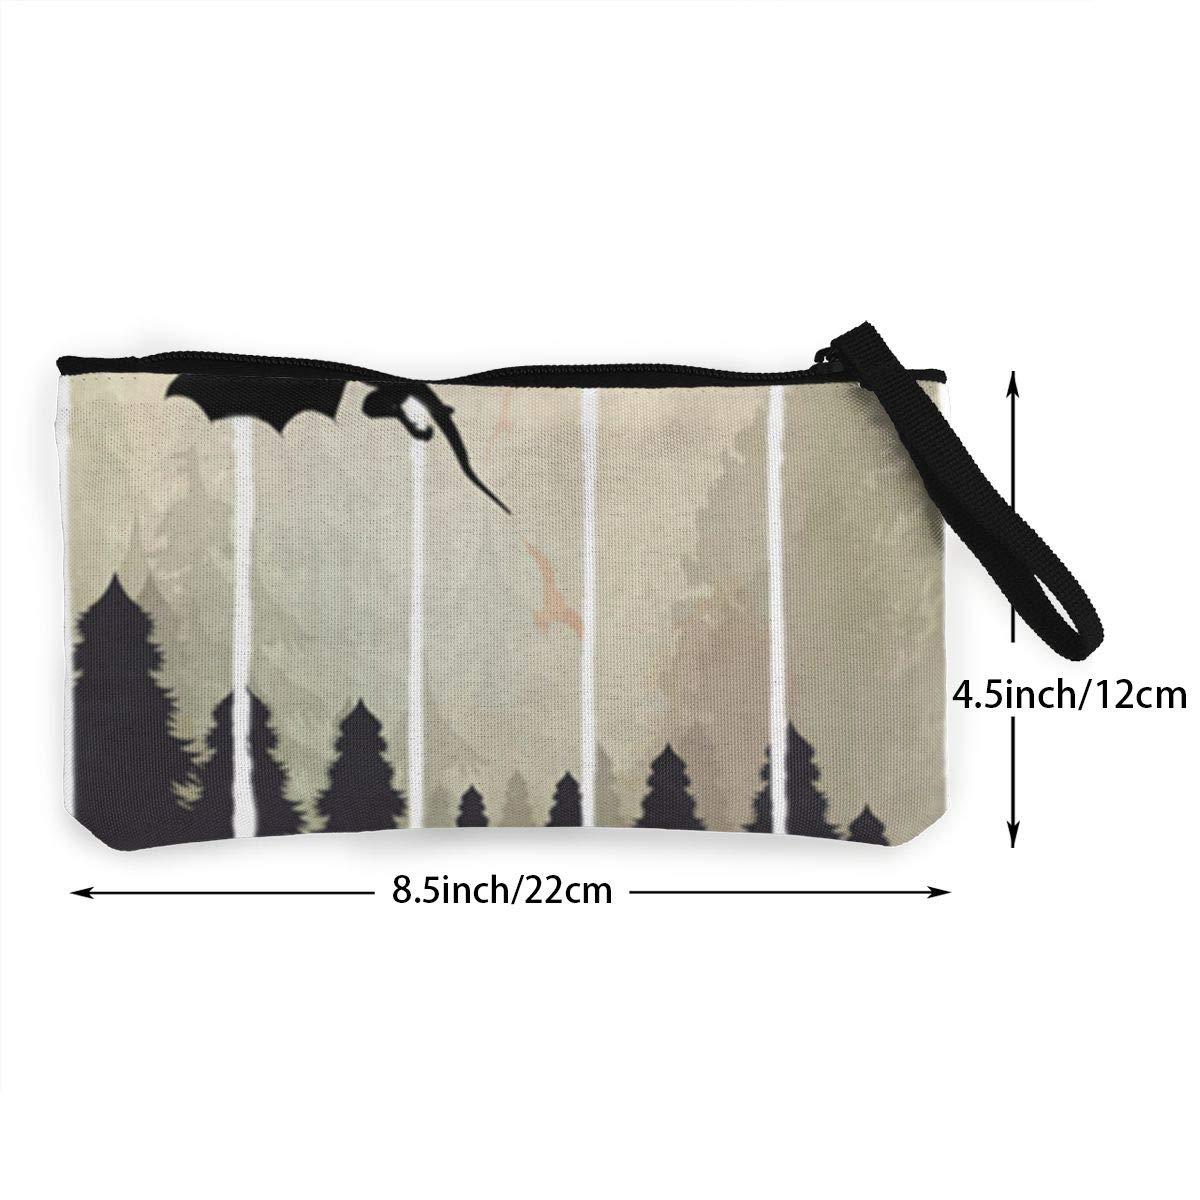 Make Up Bag TR7FD15DE Fencing Zipper Coin Purse Canvas Change Wallet Canvas Cash Coin Purse Cellphone Bag With Handle